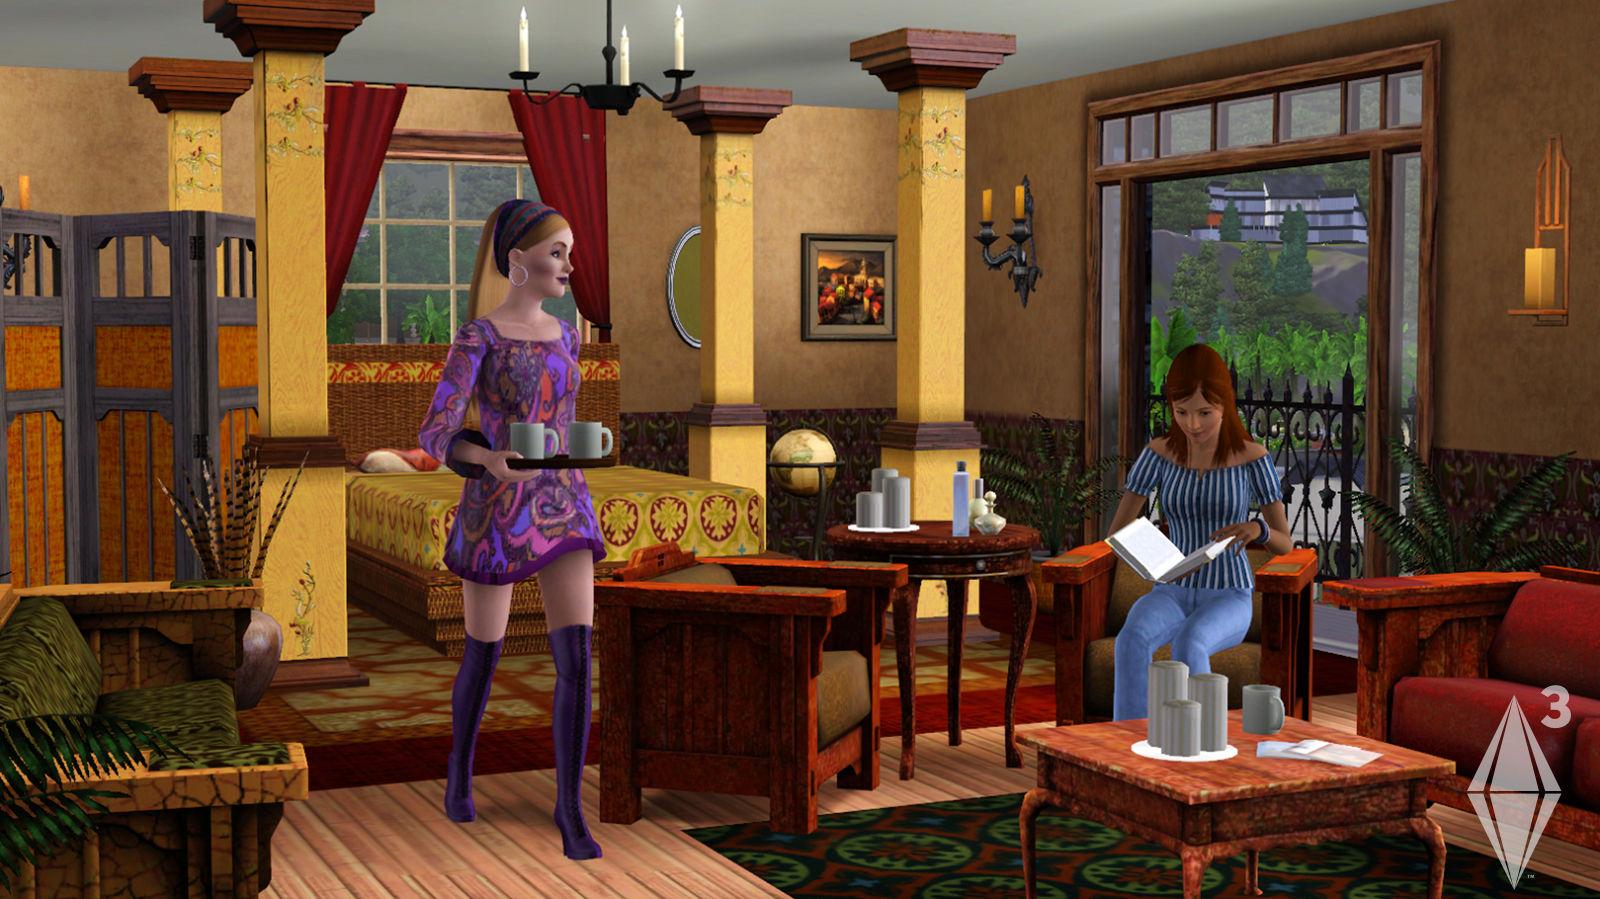 The Sims 3 (Симс 3) — Купить игру, описание, системные ...: http://p-play.ru/game/the-sims-3/